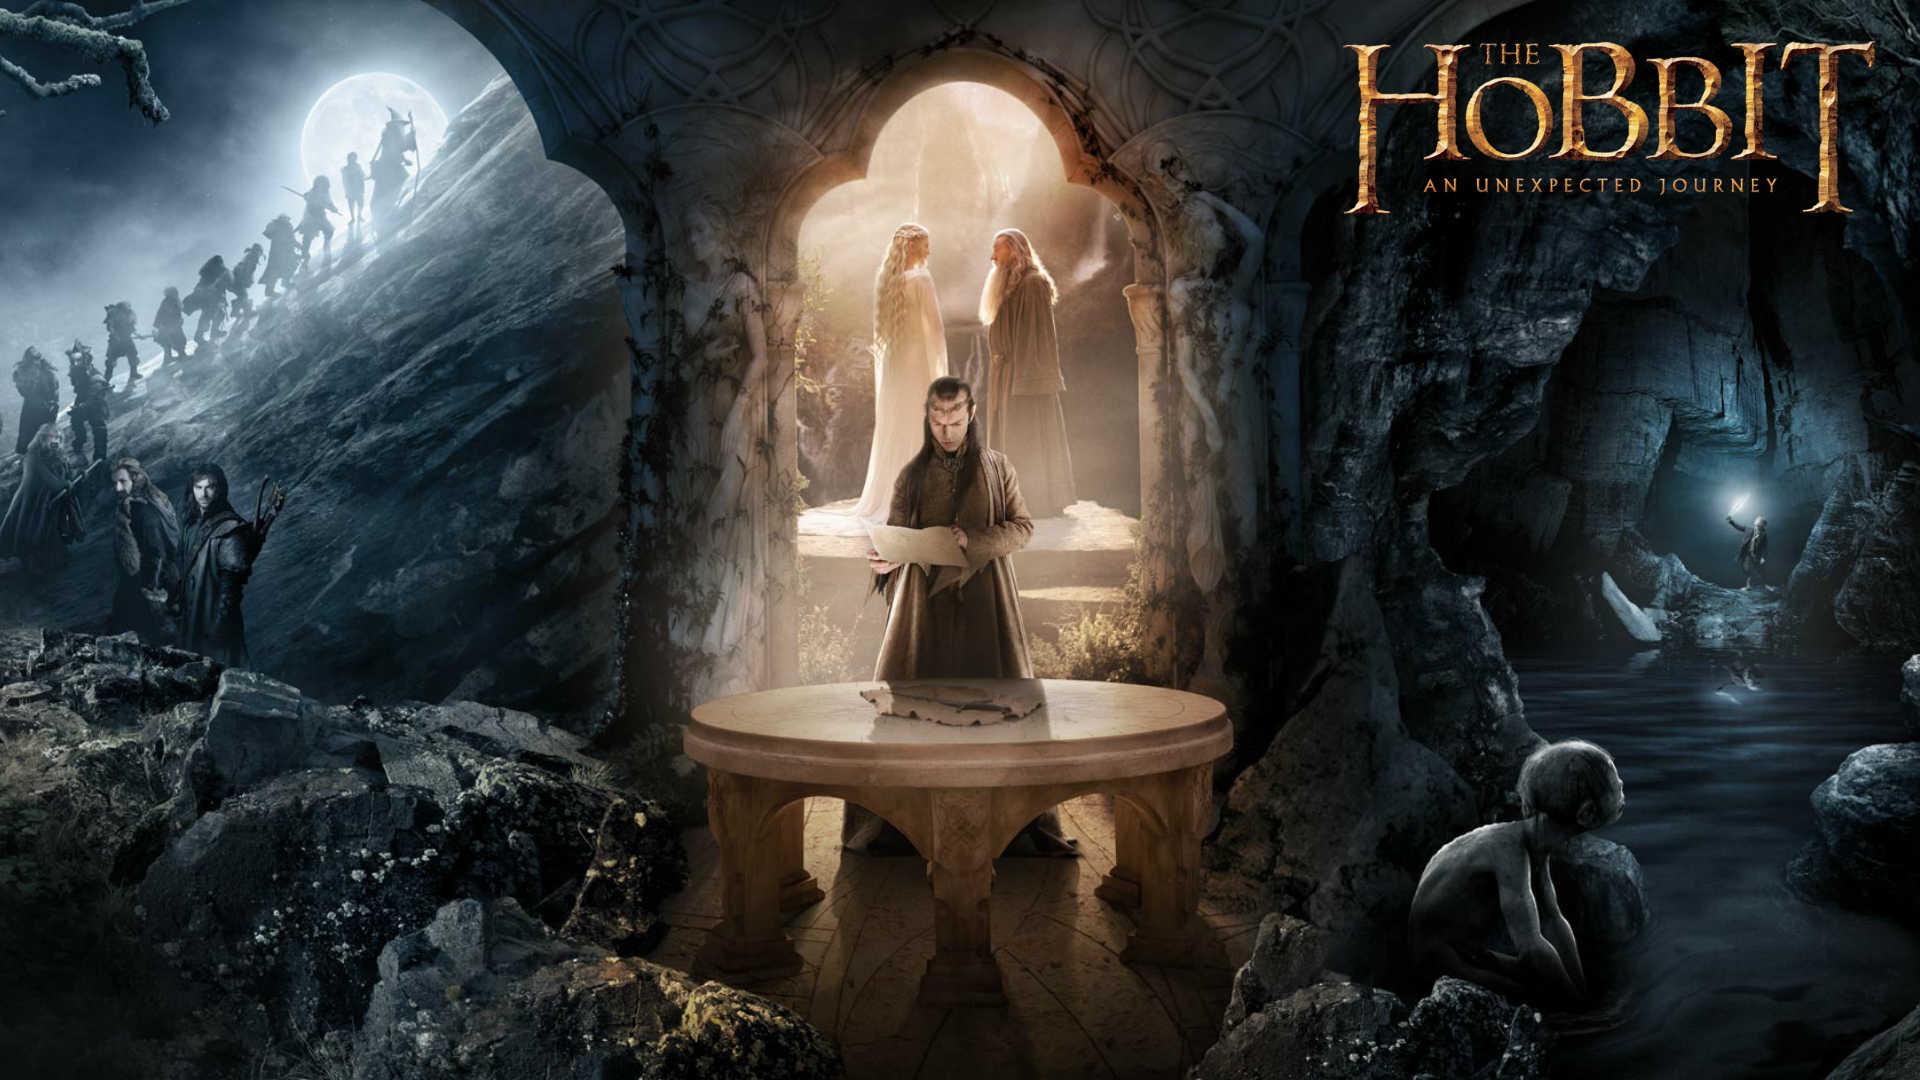 1920x1080px The Hobbit Movie Wallpaper 1920x1080